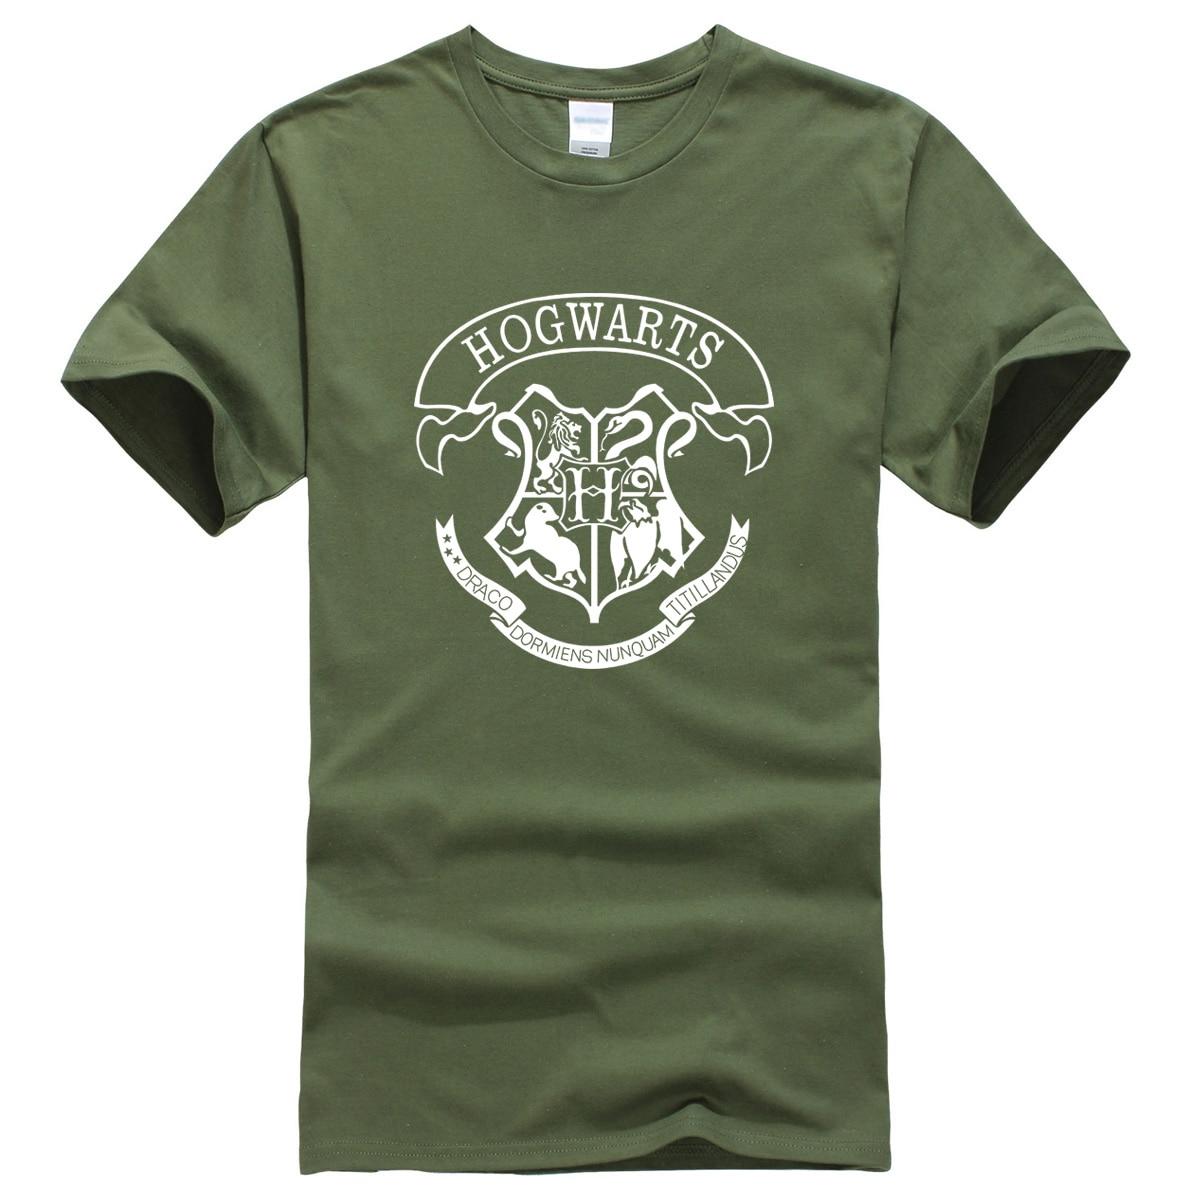 2019 Summer Men's T-shirts Hogwarts Printed Fashion Shirts Cotton T-shirt Brand Clothing Harajuku O-neck T Shirt Men Hip Hop Top